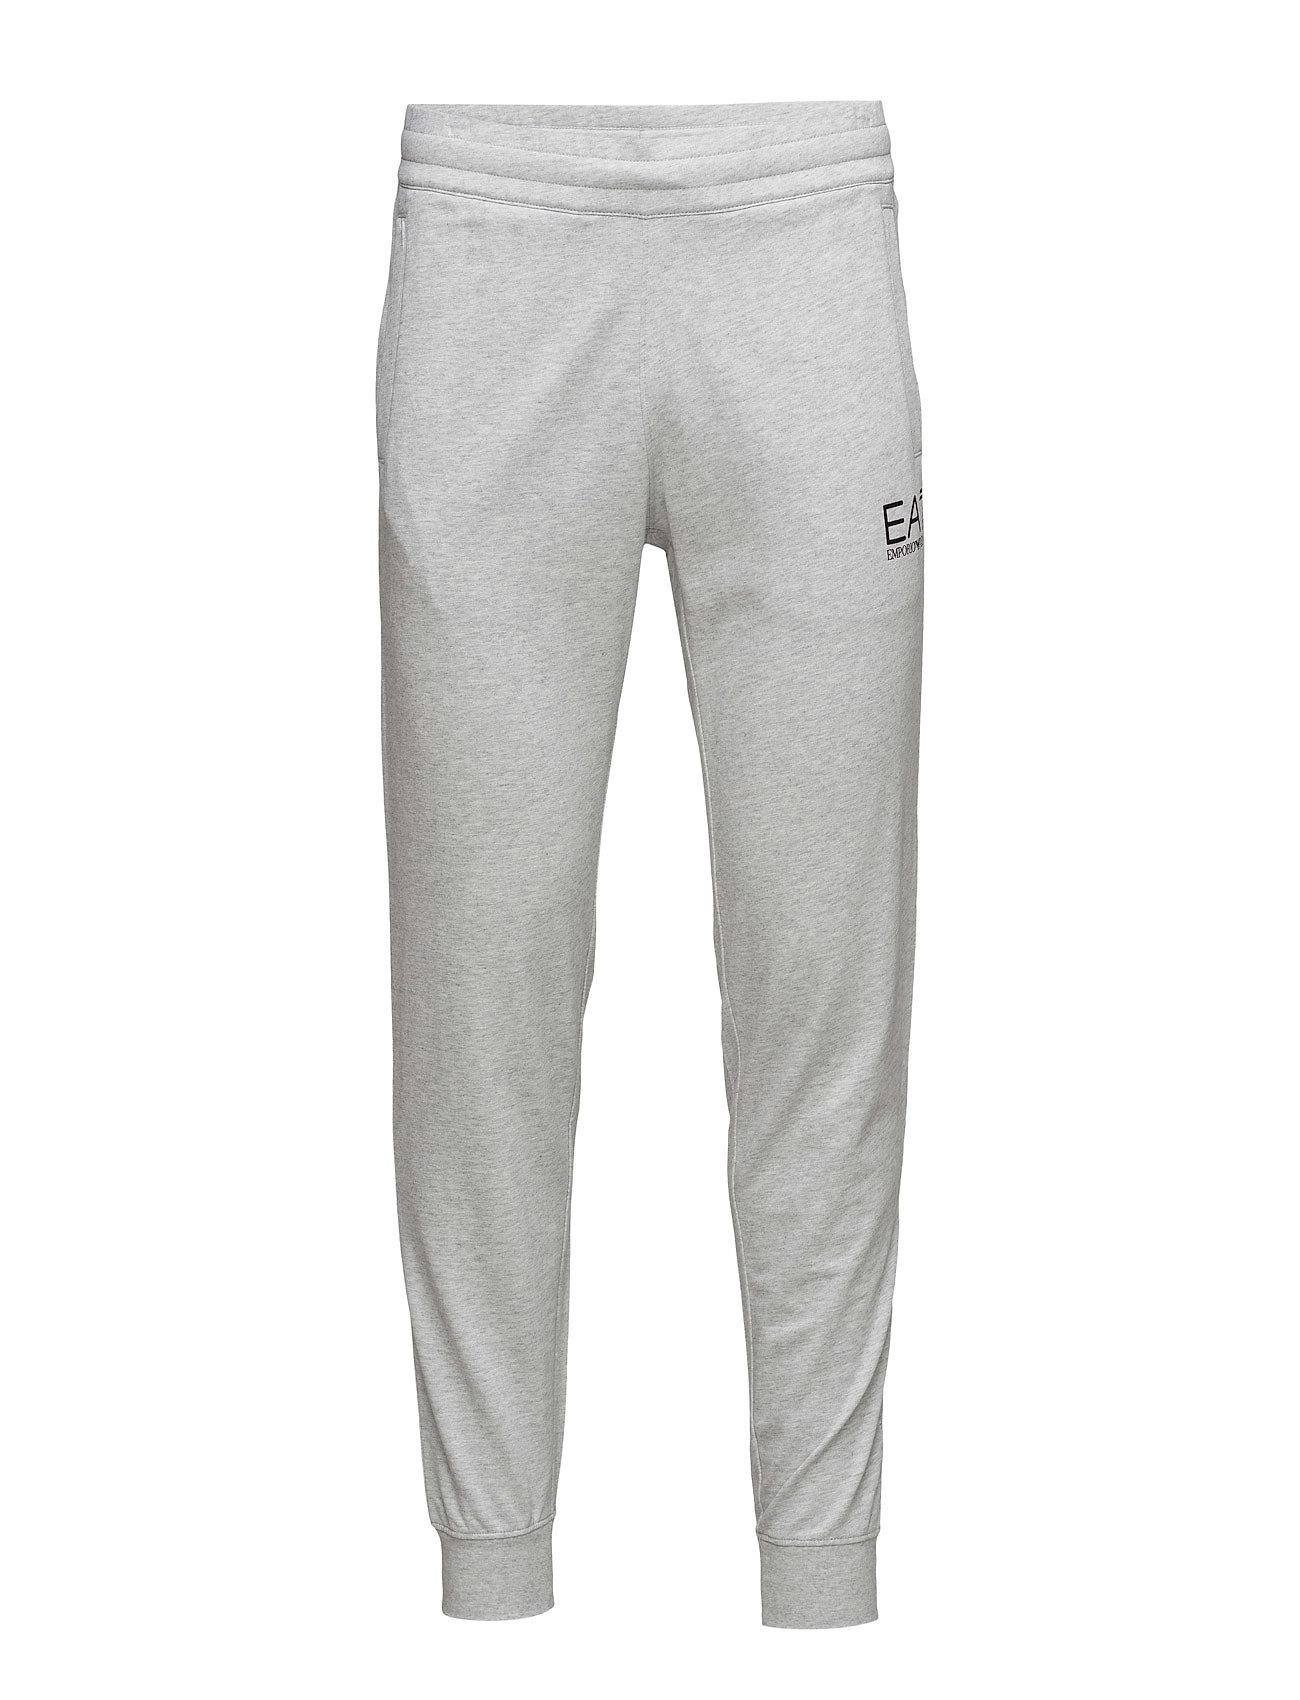 Pantaloni EA7 Joggingbukser til Herrer i